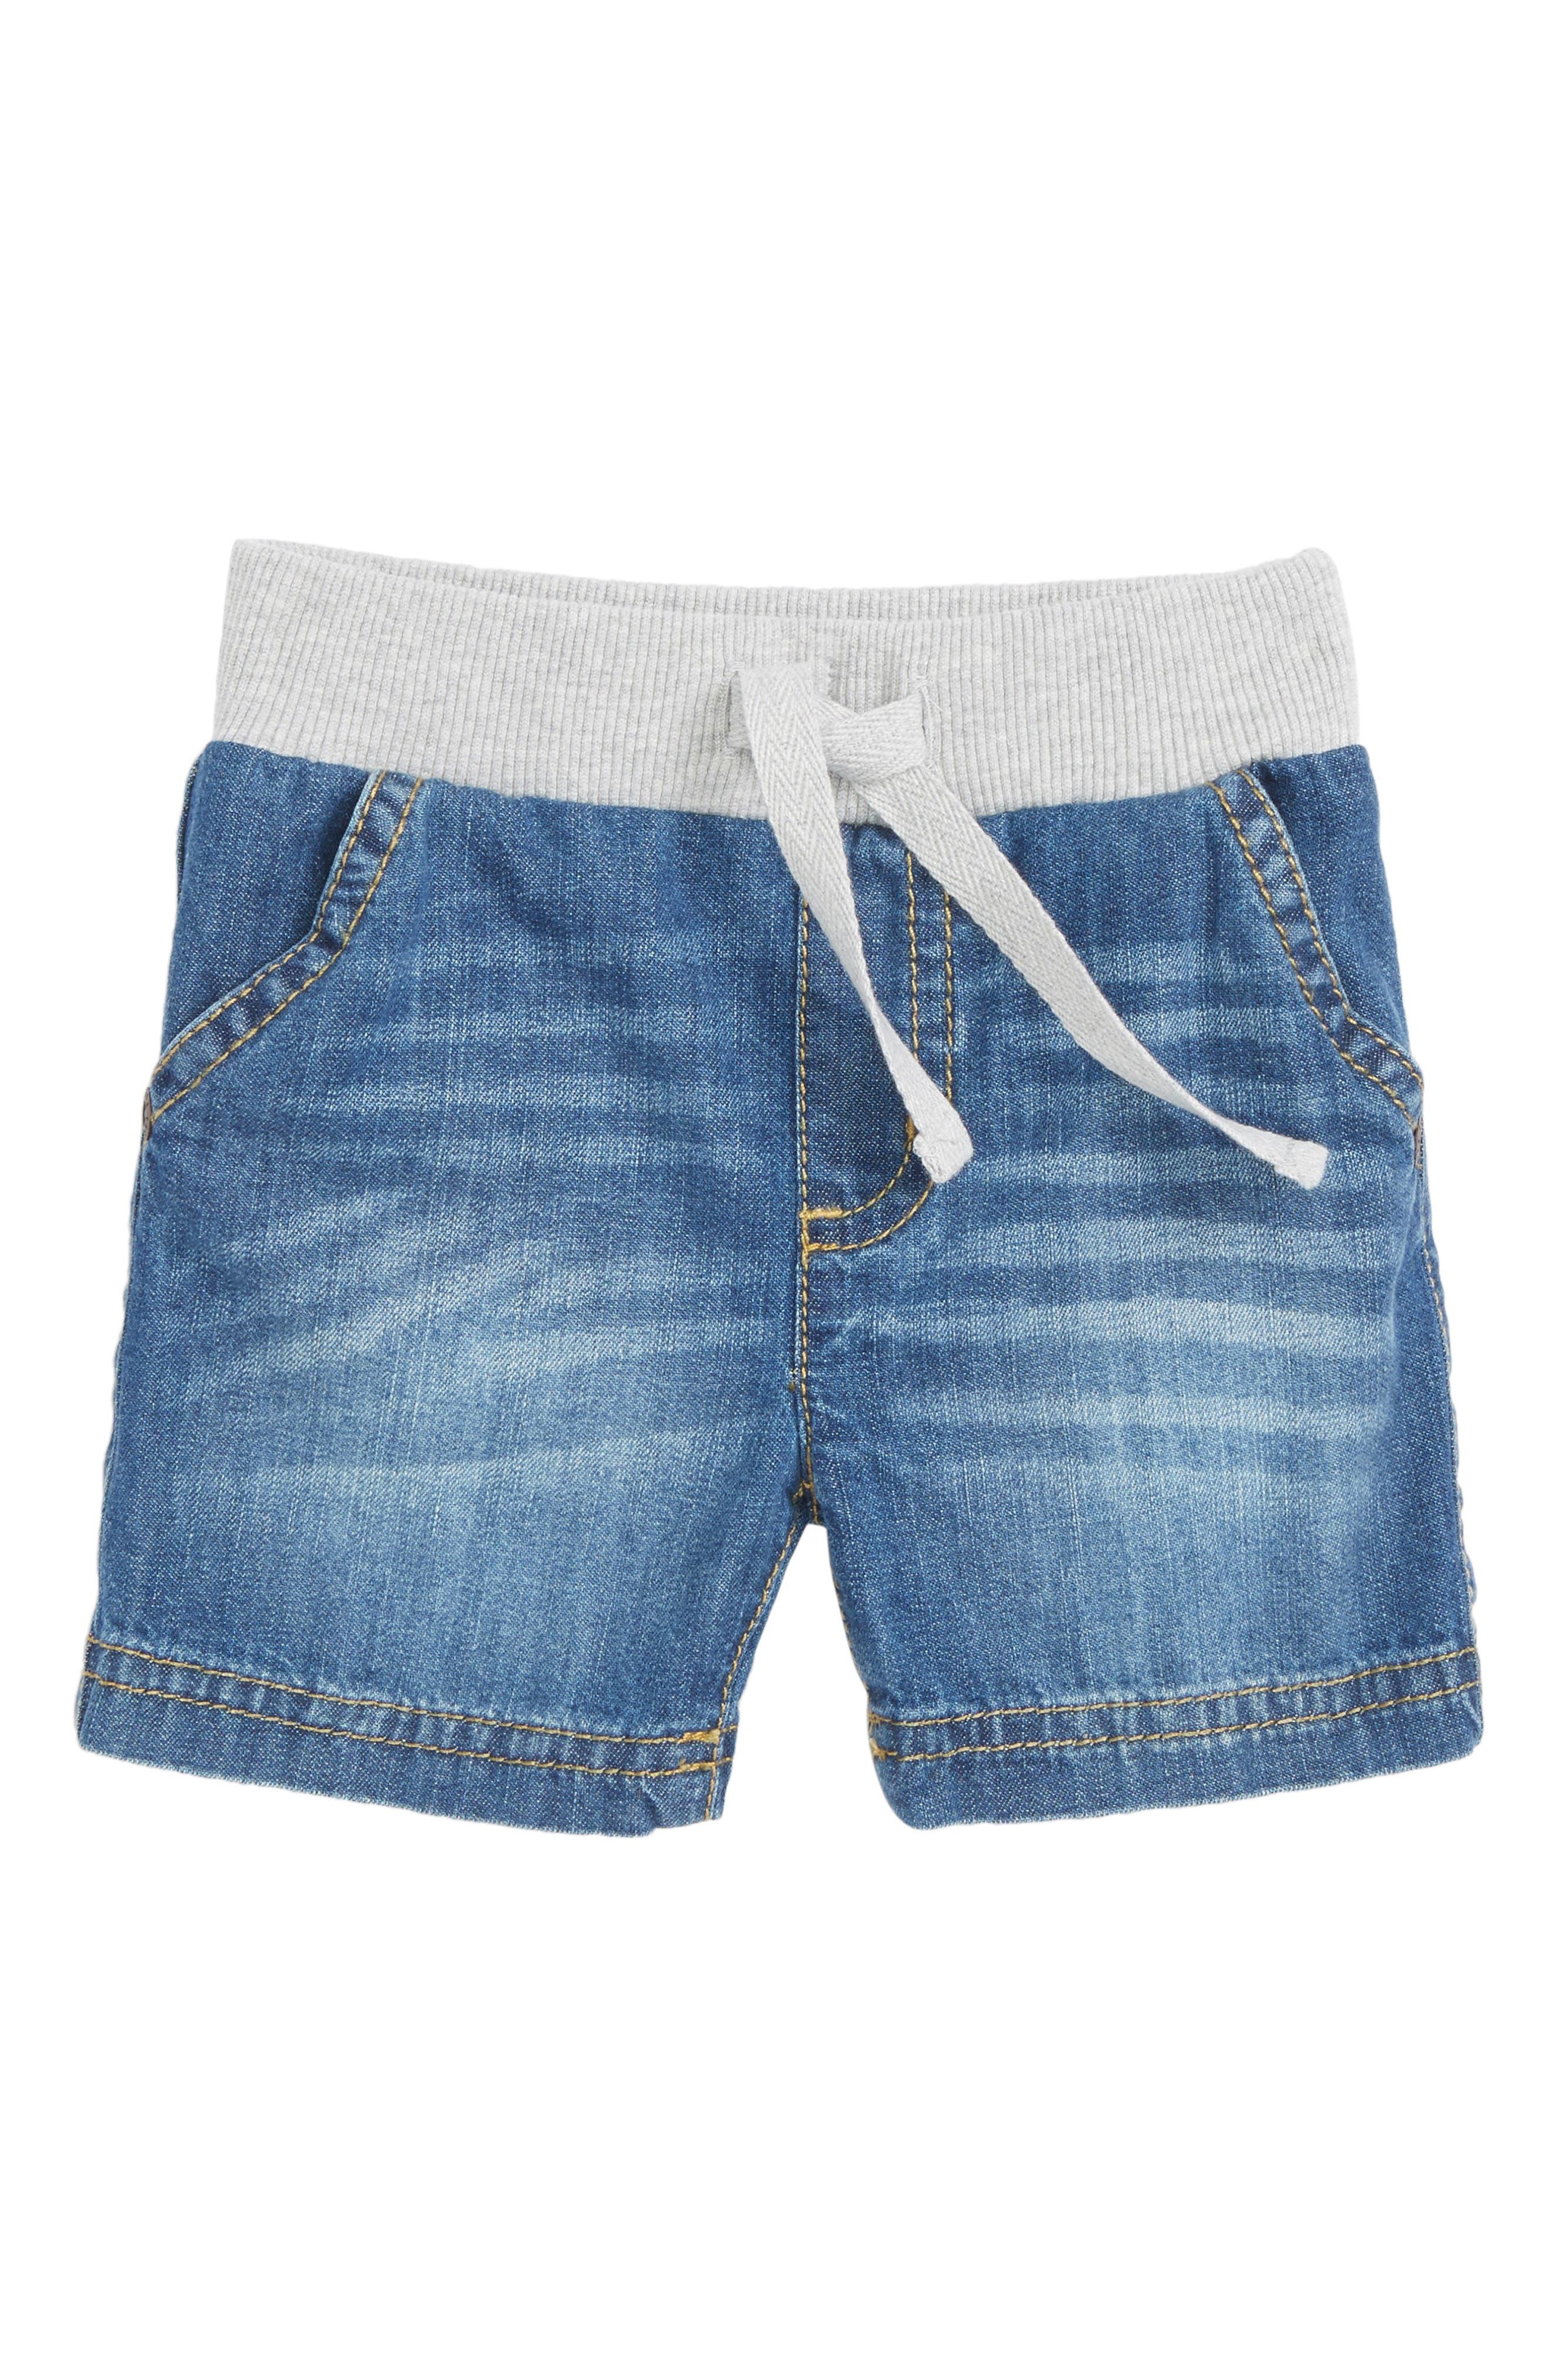 Tucker + Tate Woven Cotton Shorts (Baby)